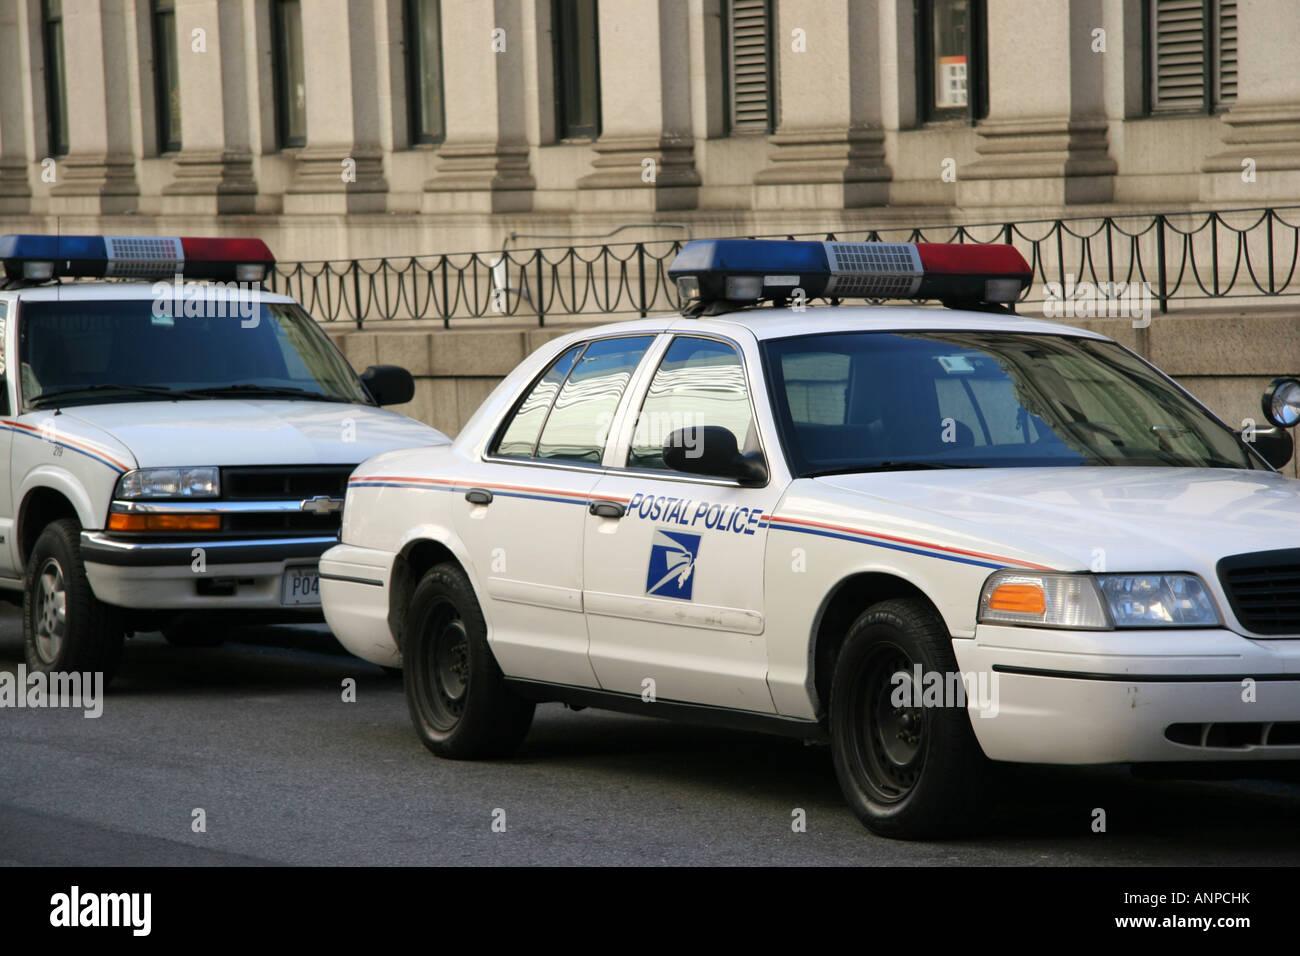 US Postal Police - Stock Image